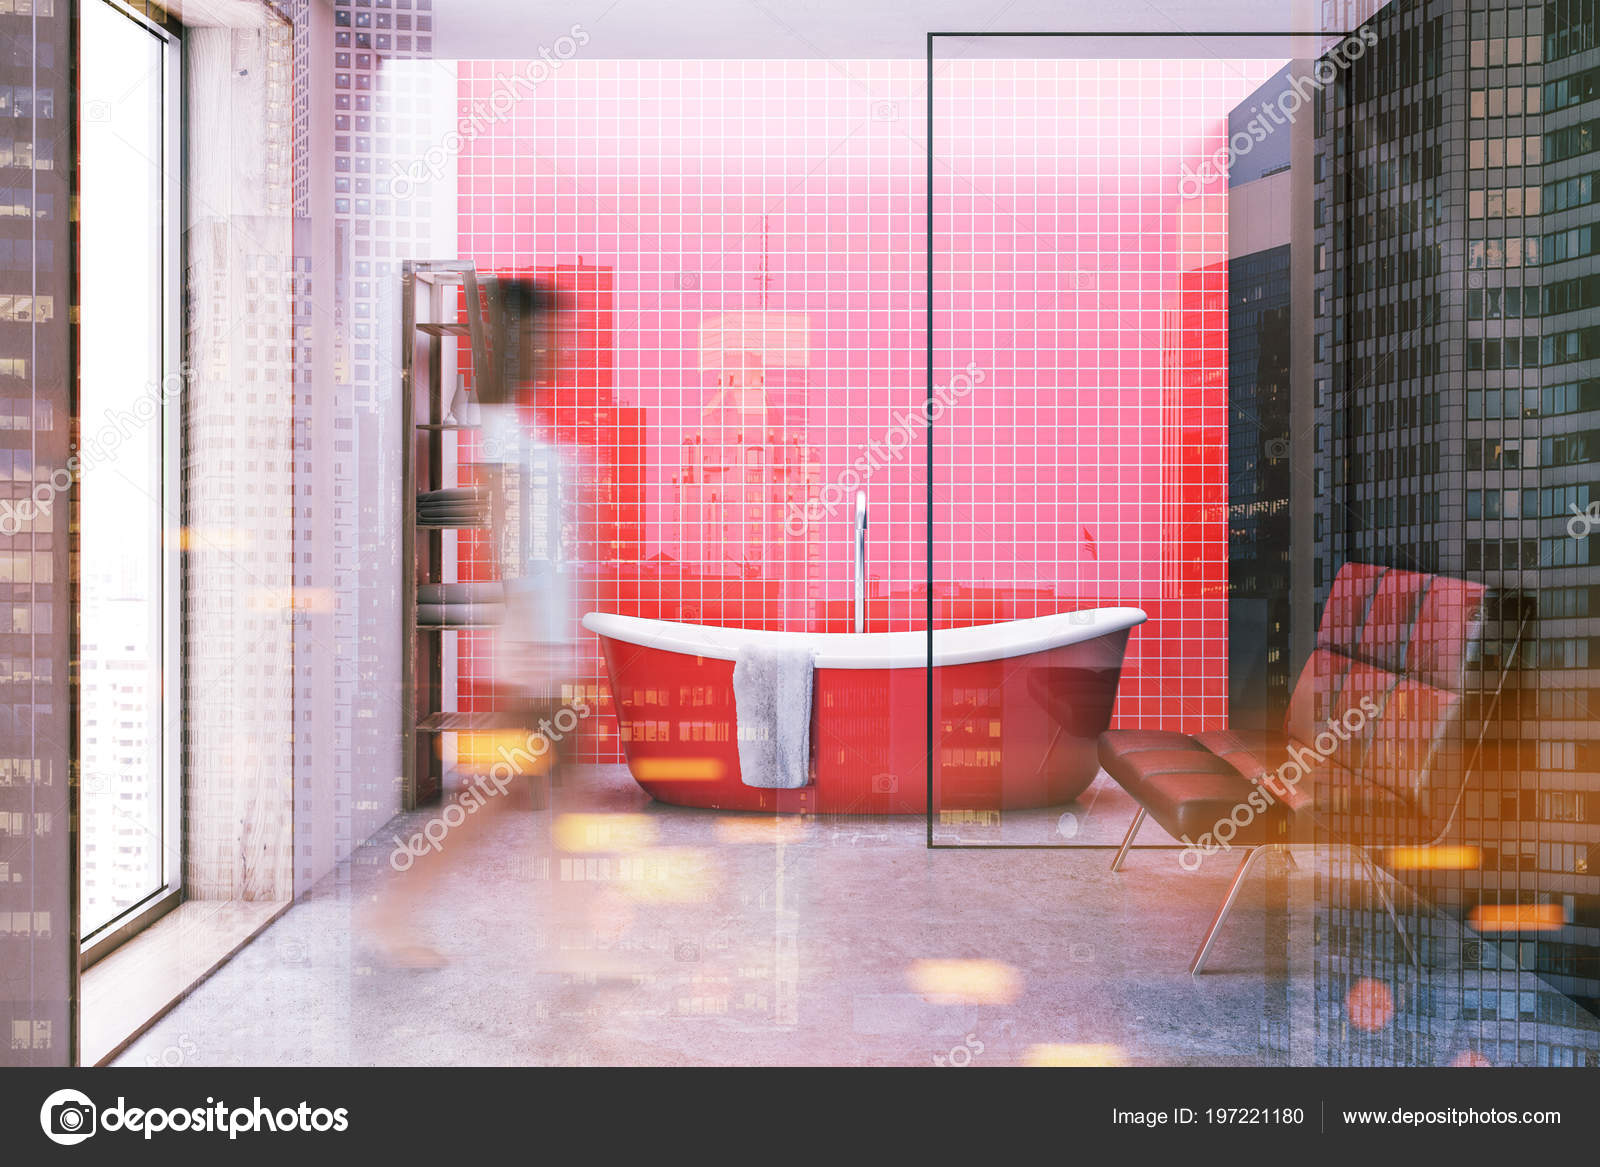 Red Tiled Bathroom Interior Red Bathtub Large Window Shelves Bench Stock Photo C Denisismagilov 197221180